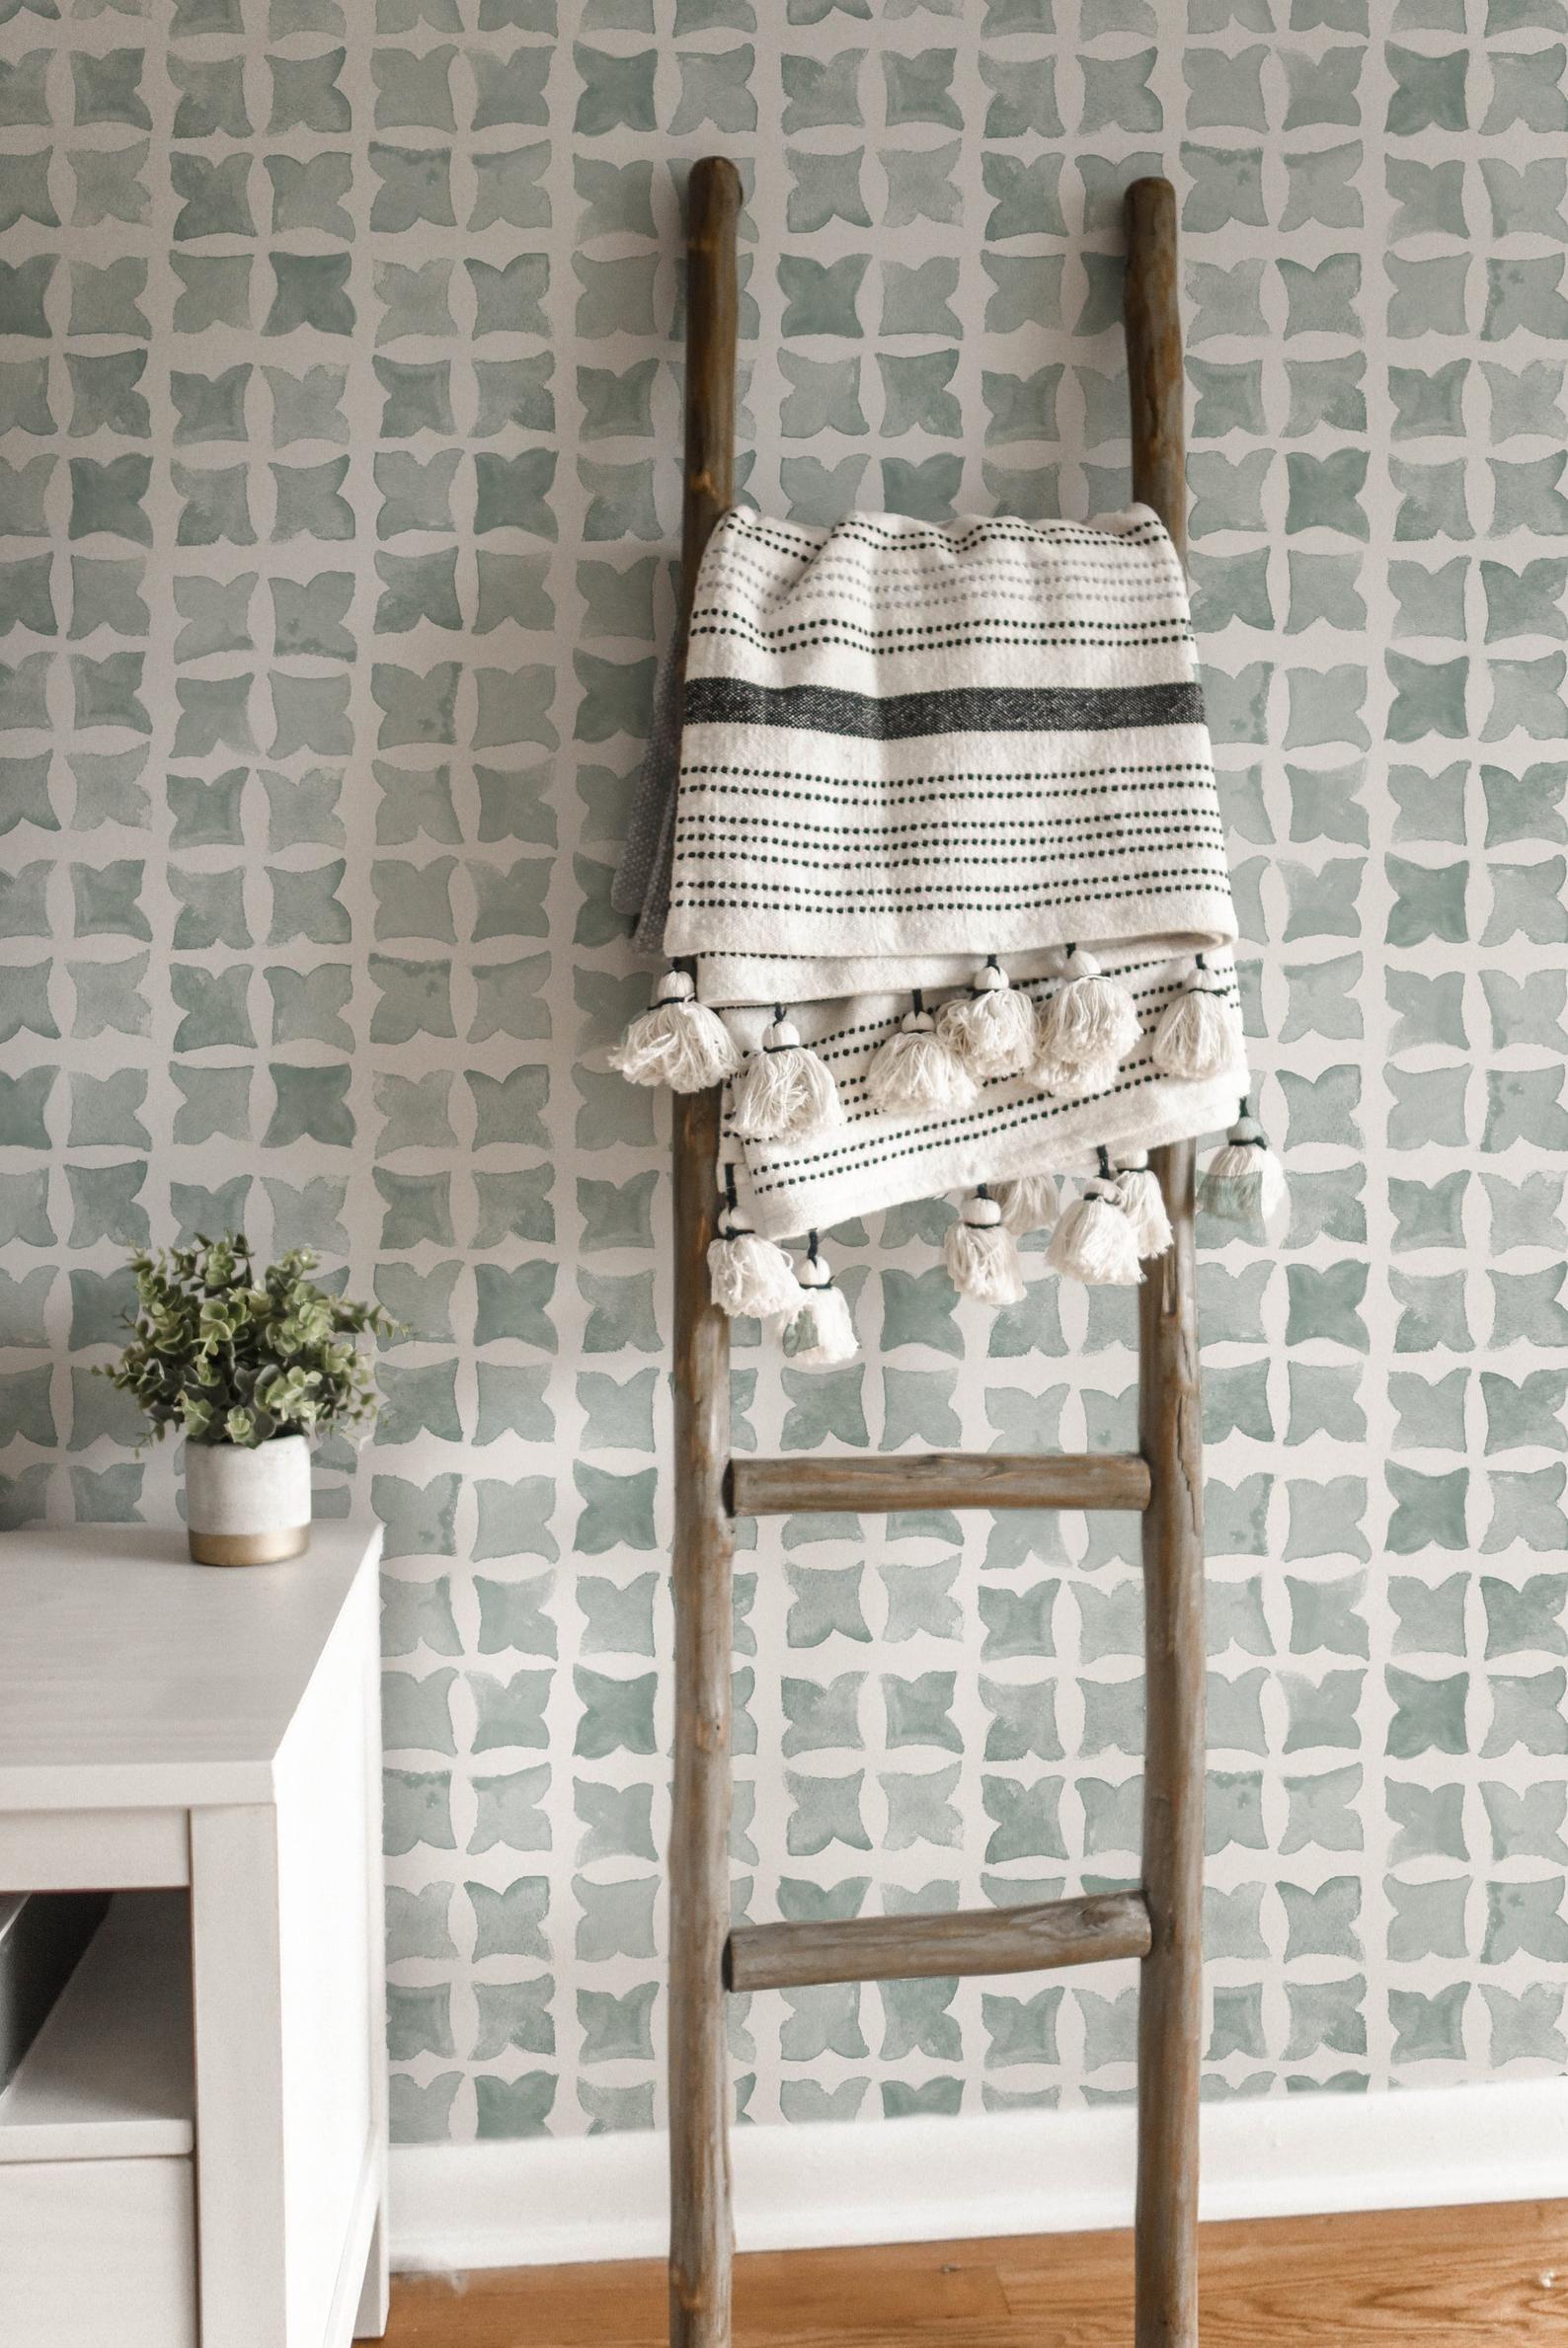 Moroccan Tile Wallpaper Sage Color Removable And Self Etsy Tile Wallpaper Moroccan Tile Accent Wall